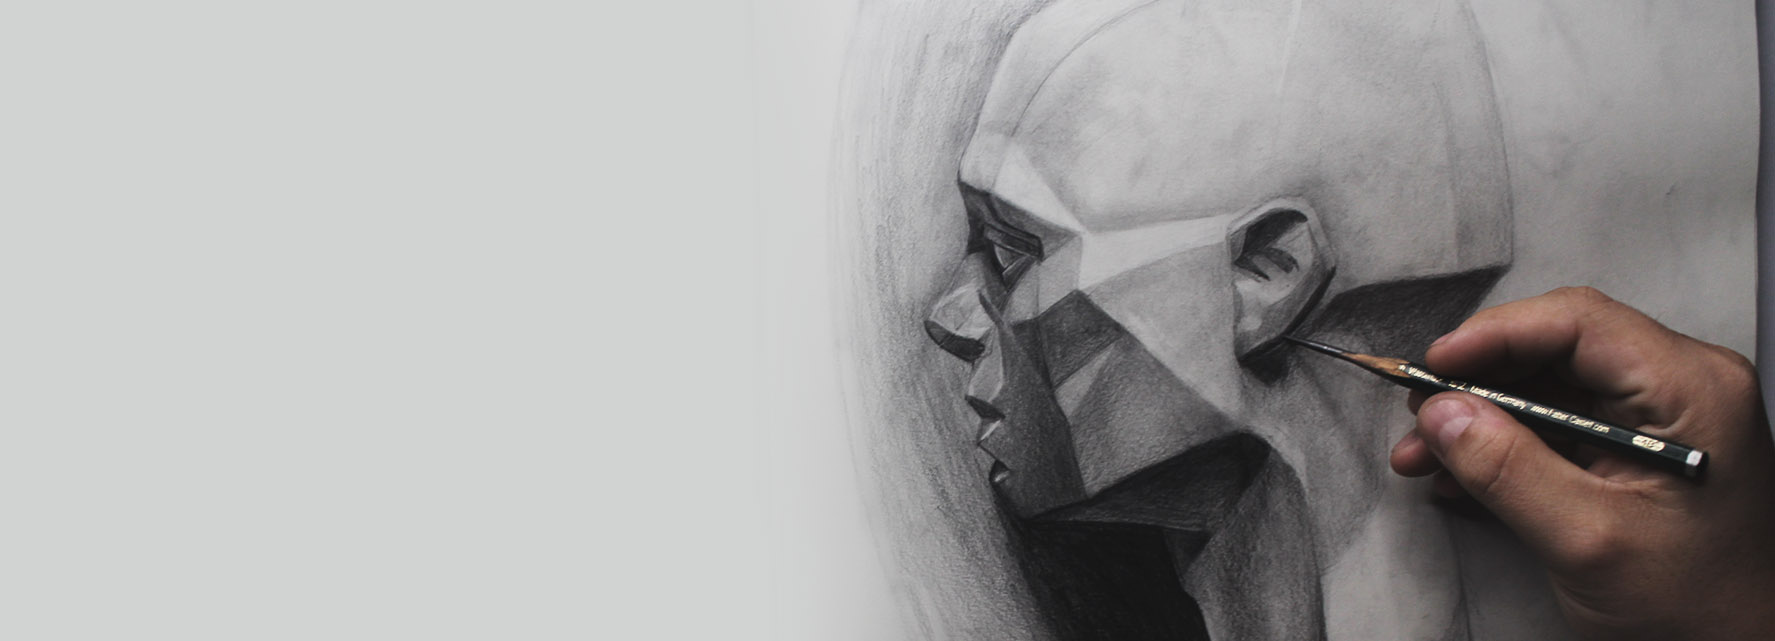 Aprende a dibujar retratos realistas de cero a profesional